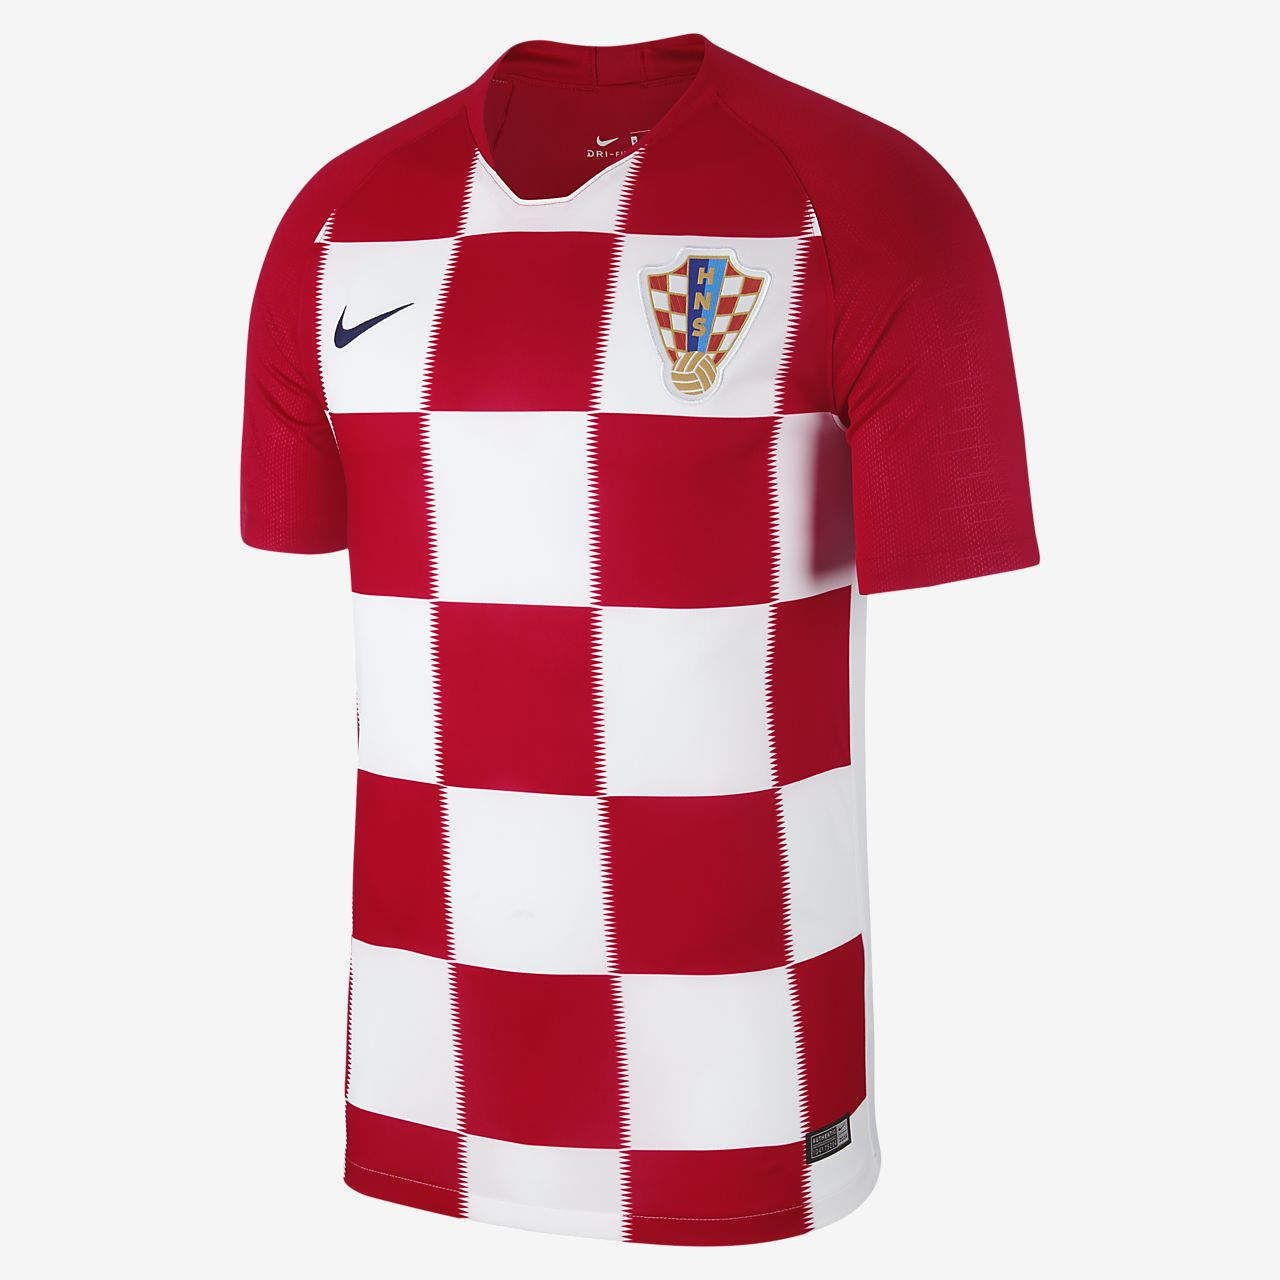 where to buy official soccer jerseys - techinternationalcorp.com ac38dedd6